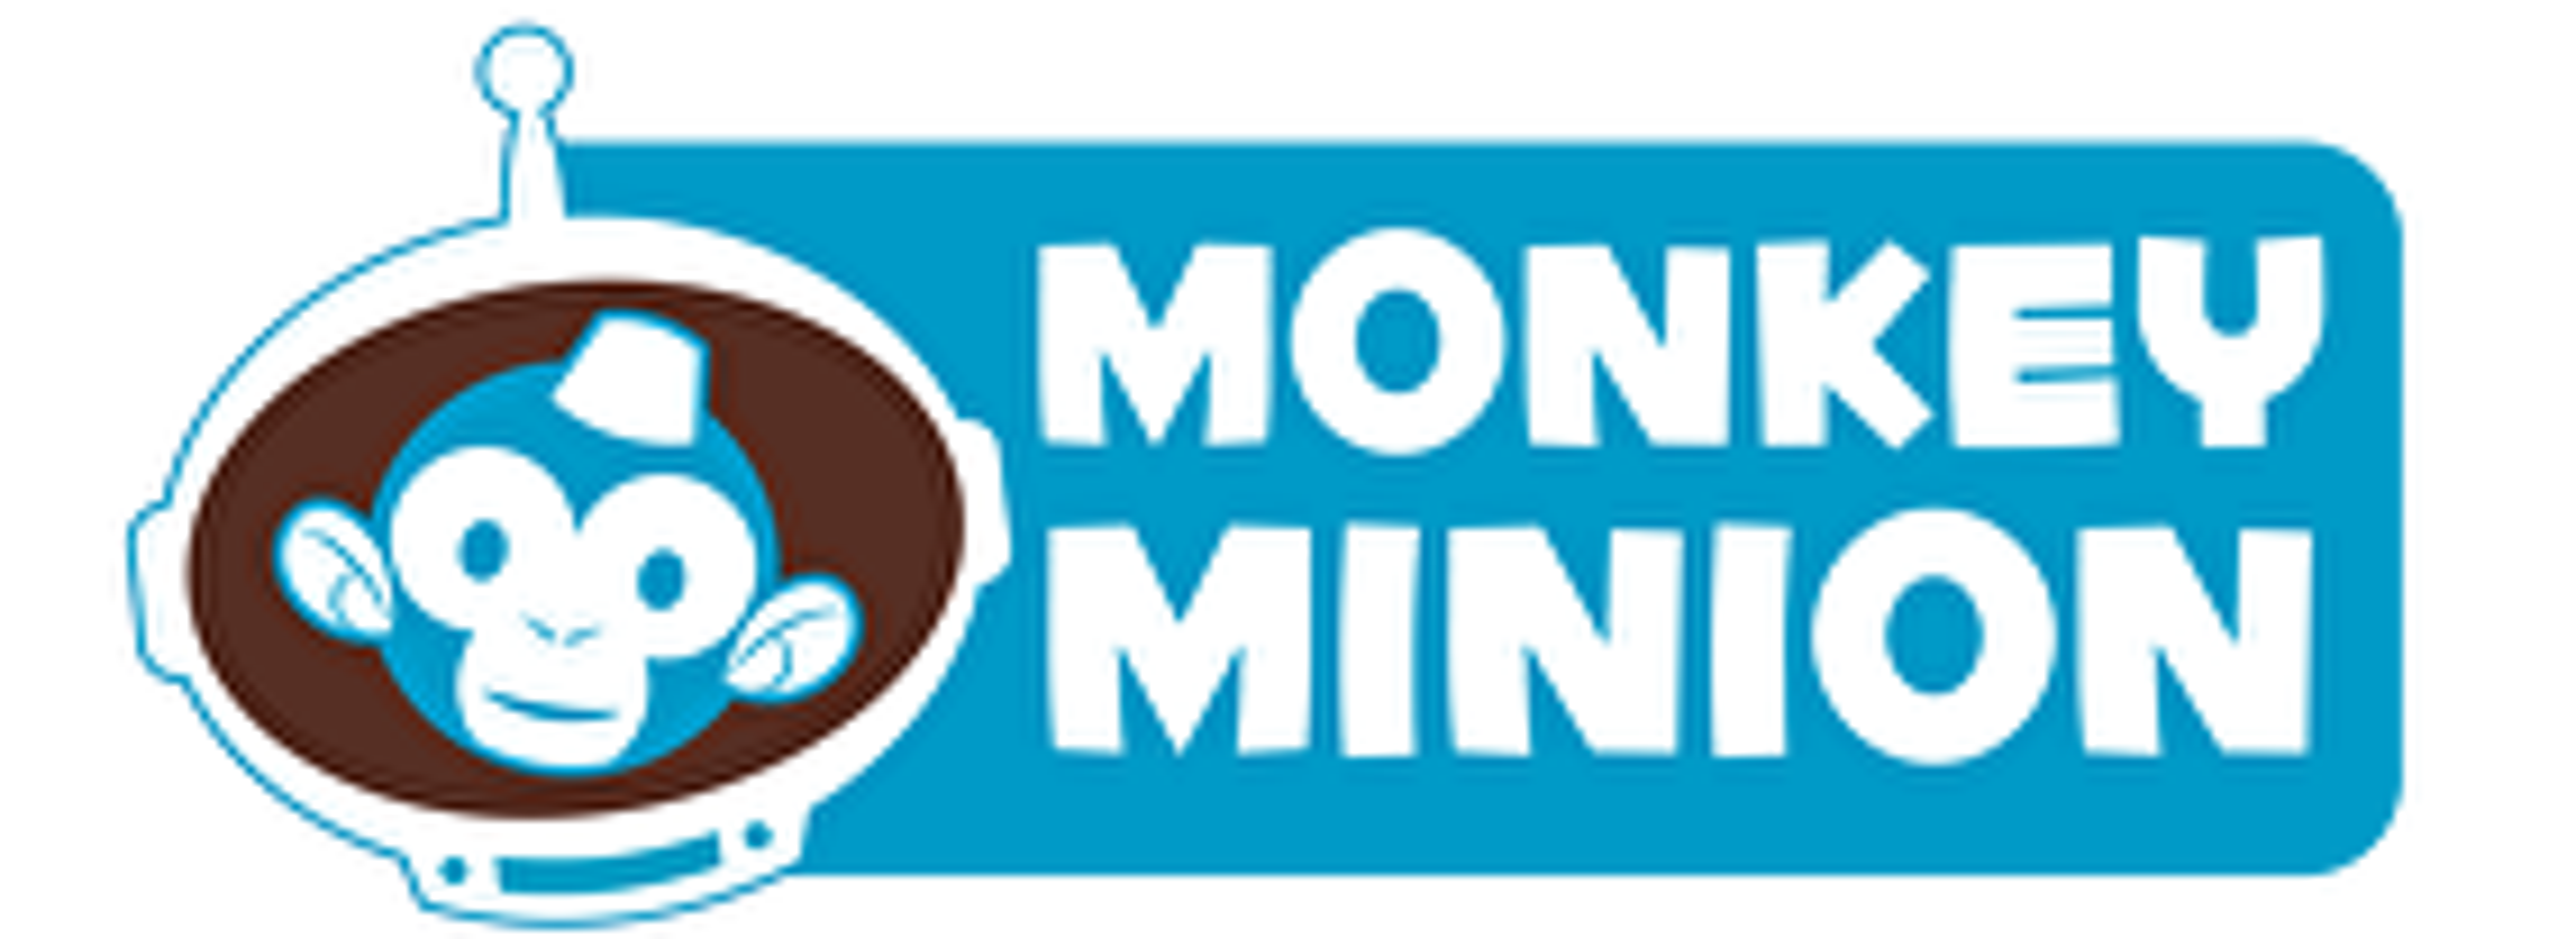 Monkey Minion/Dane Ault